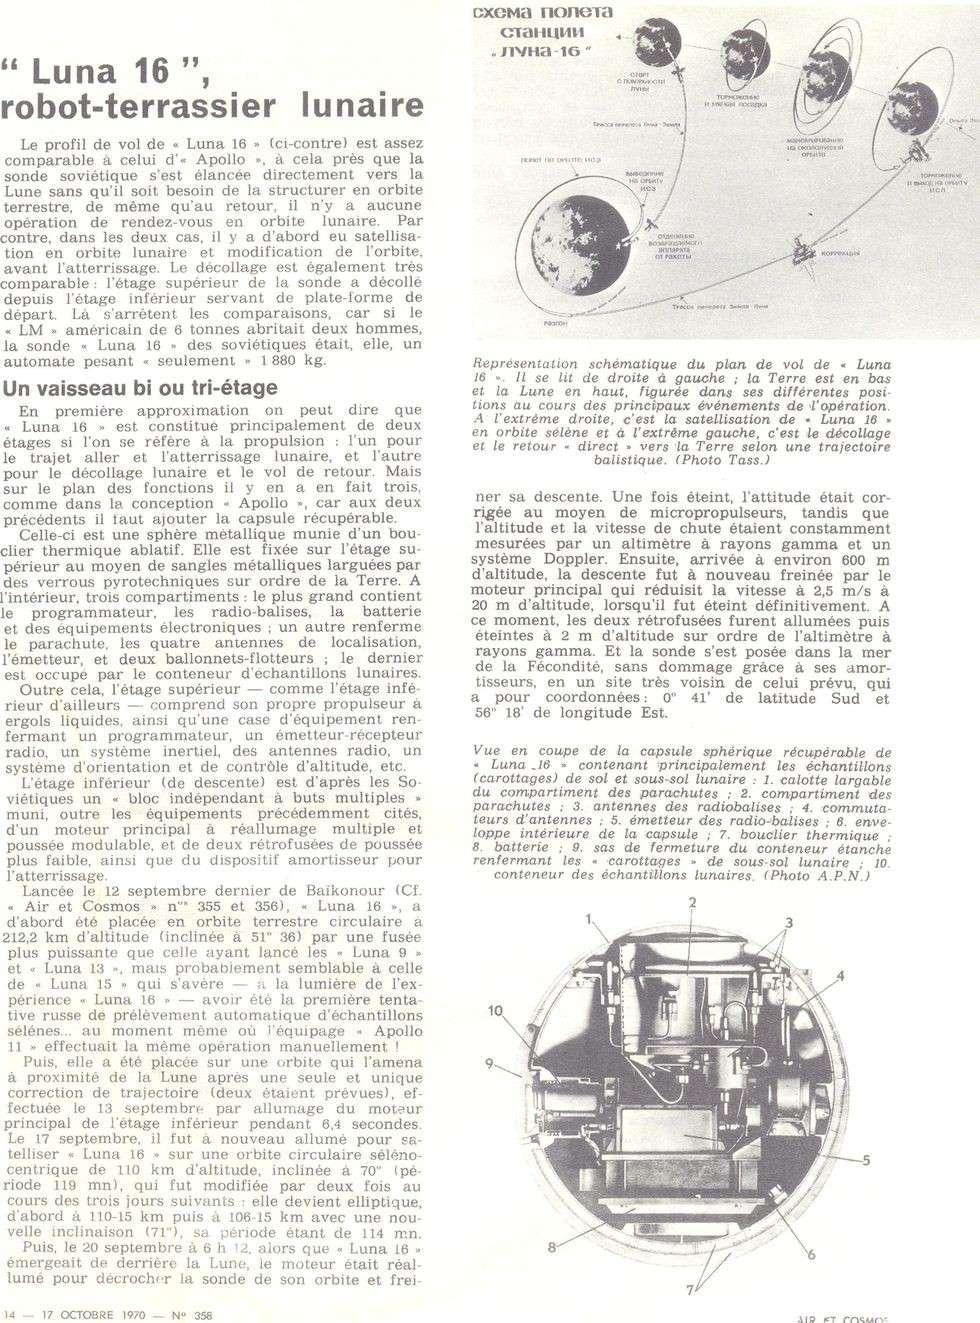 12 septembre 1970 - Luna 16 (trop tard) 70101710